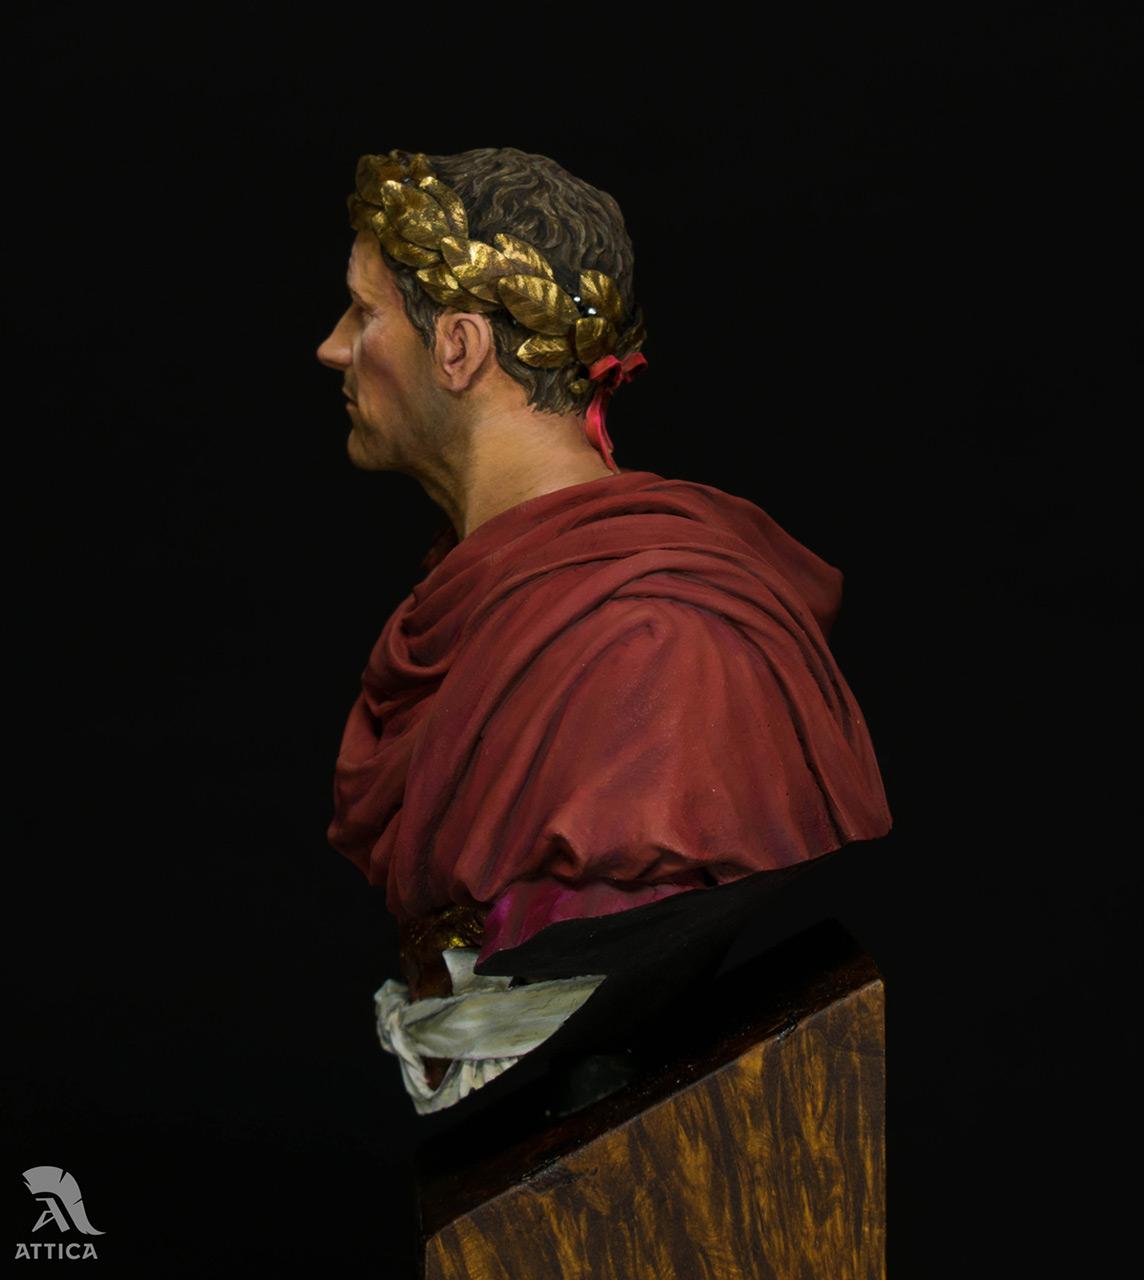 Figures: The Triumpher, photo #3